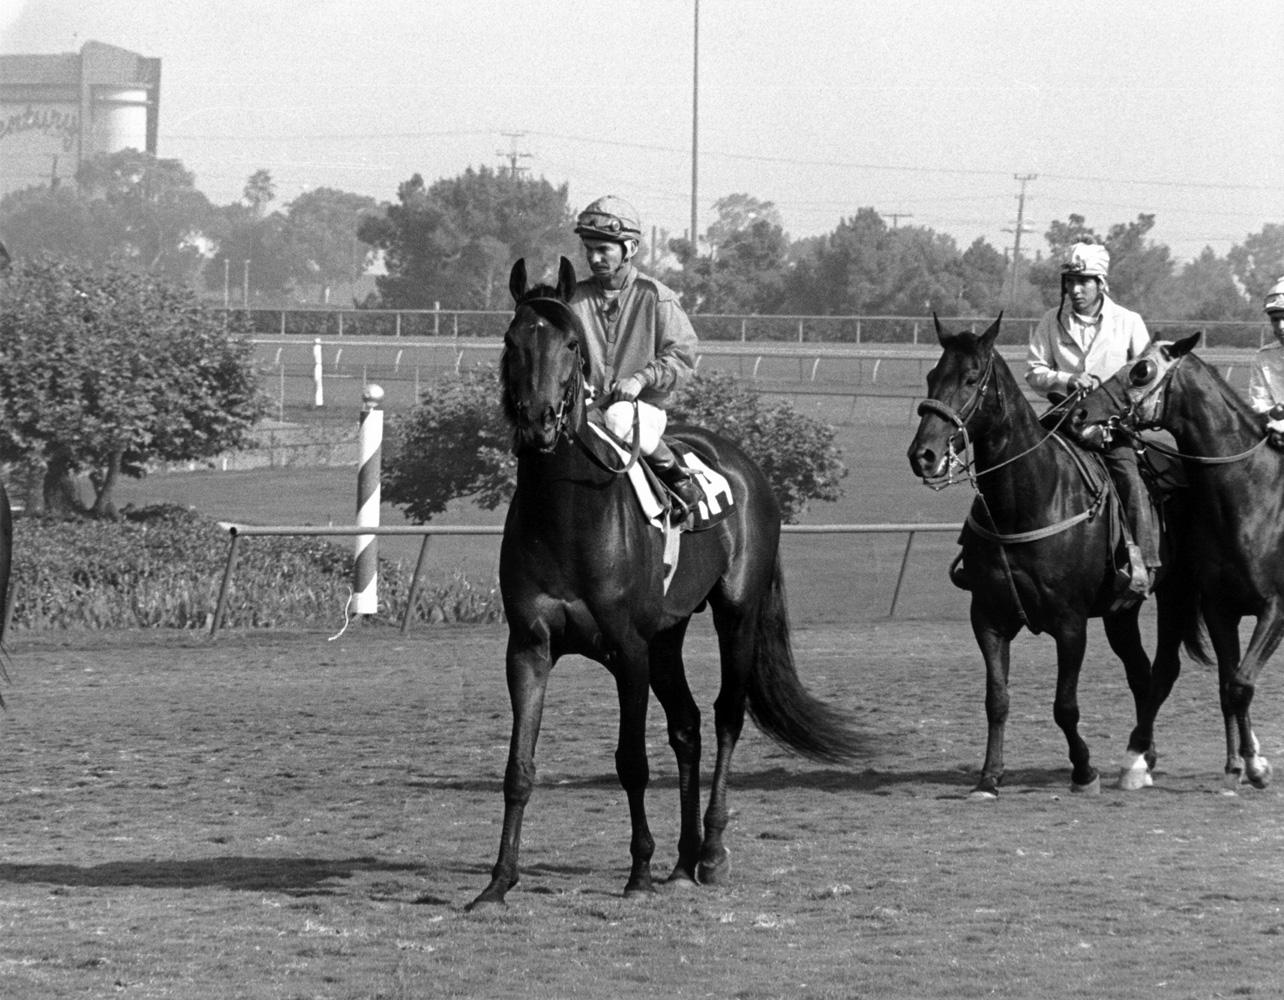 Cougar II (Bill Shoemaker up) at the 1973 Sunset Handicap at Santa Anita, his last career win (Bill Mochon/Museum Collection)